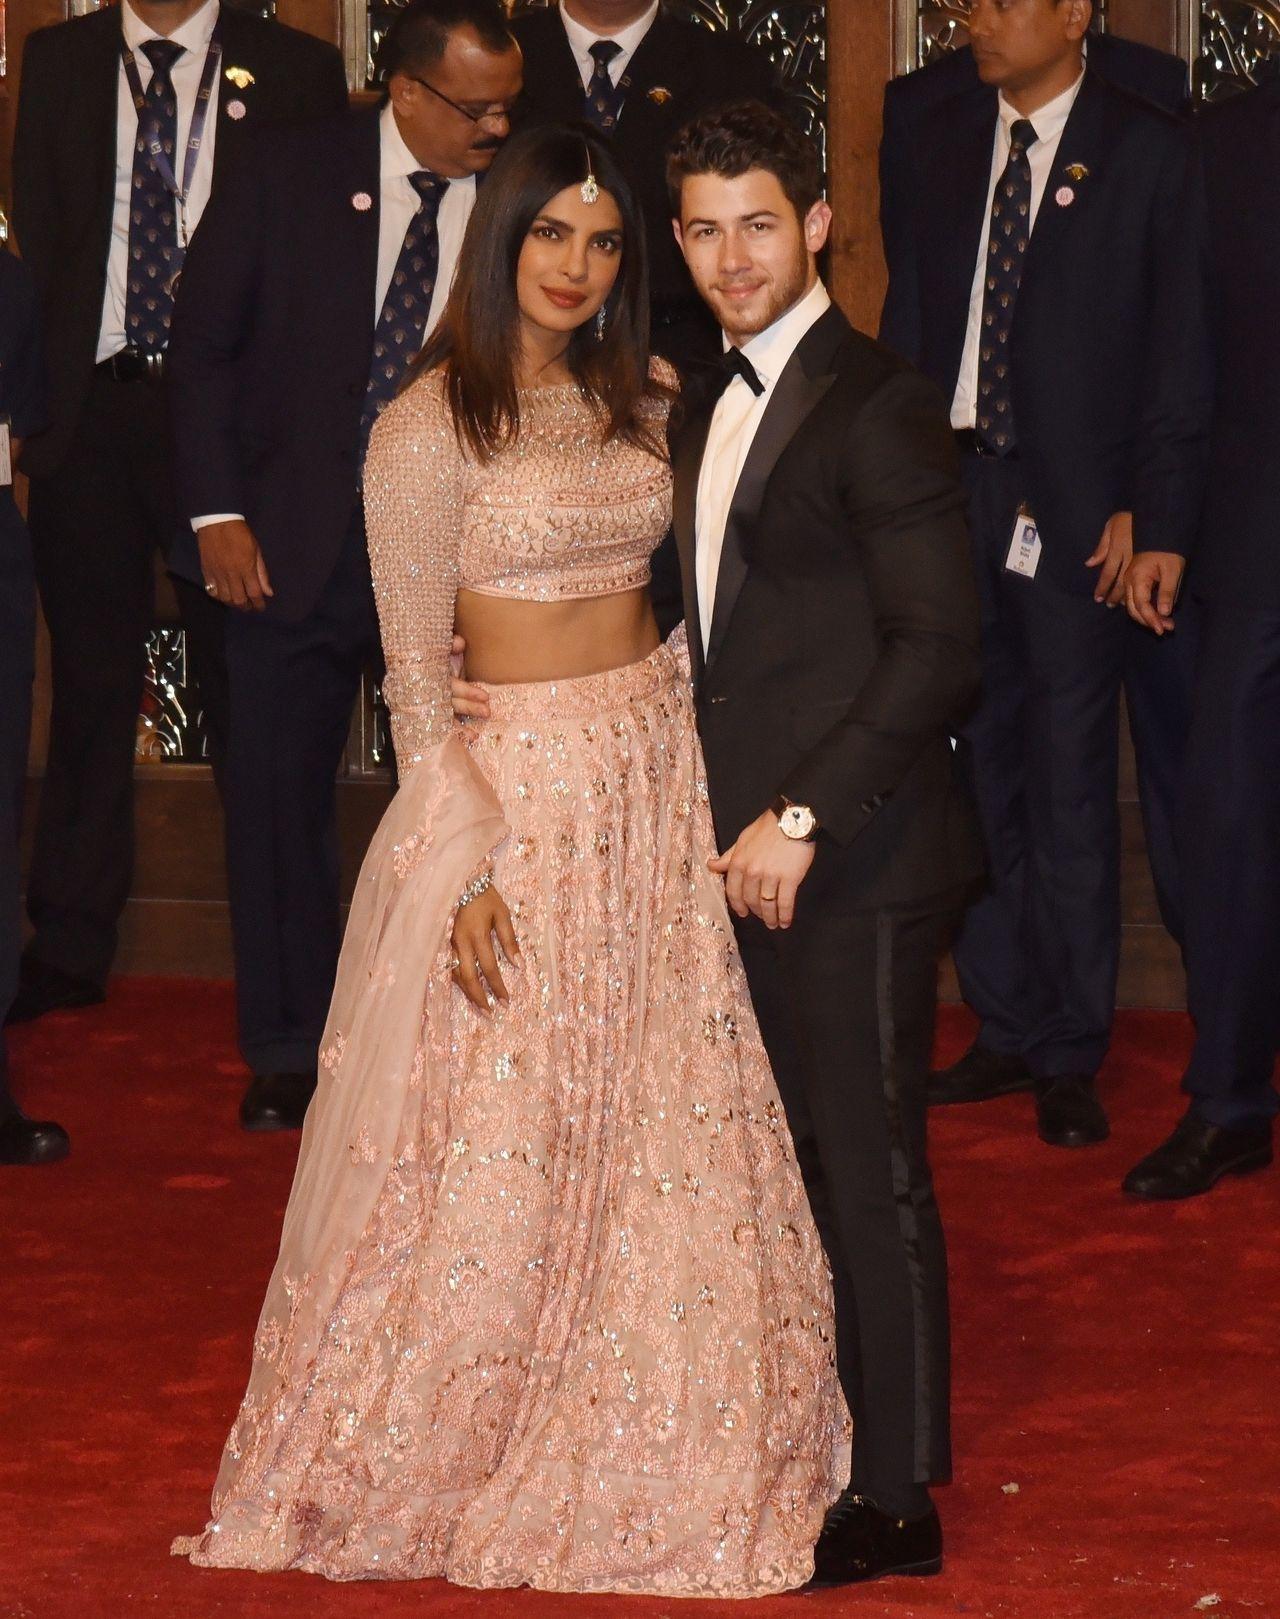 Priyanka Chopra and Nick Jonas seen arriving at Isha Ambani Wedding in Mumbai / Zed Jameson / BACKGRID , kod: Priyanka Chopra and Nick Jonas